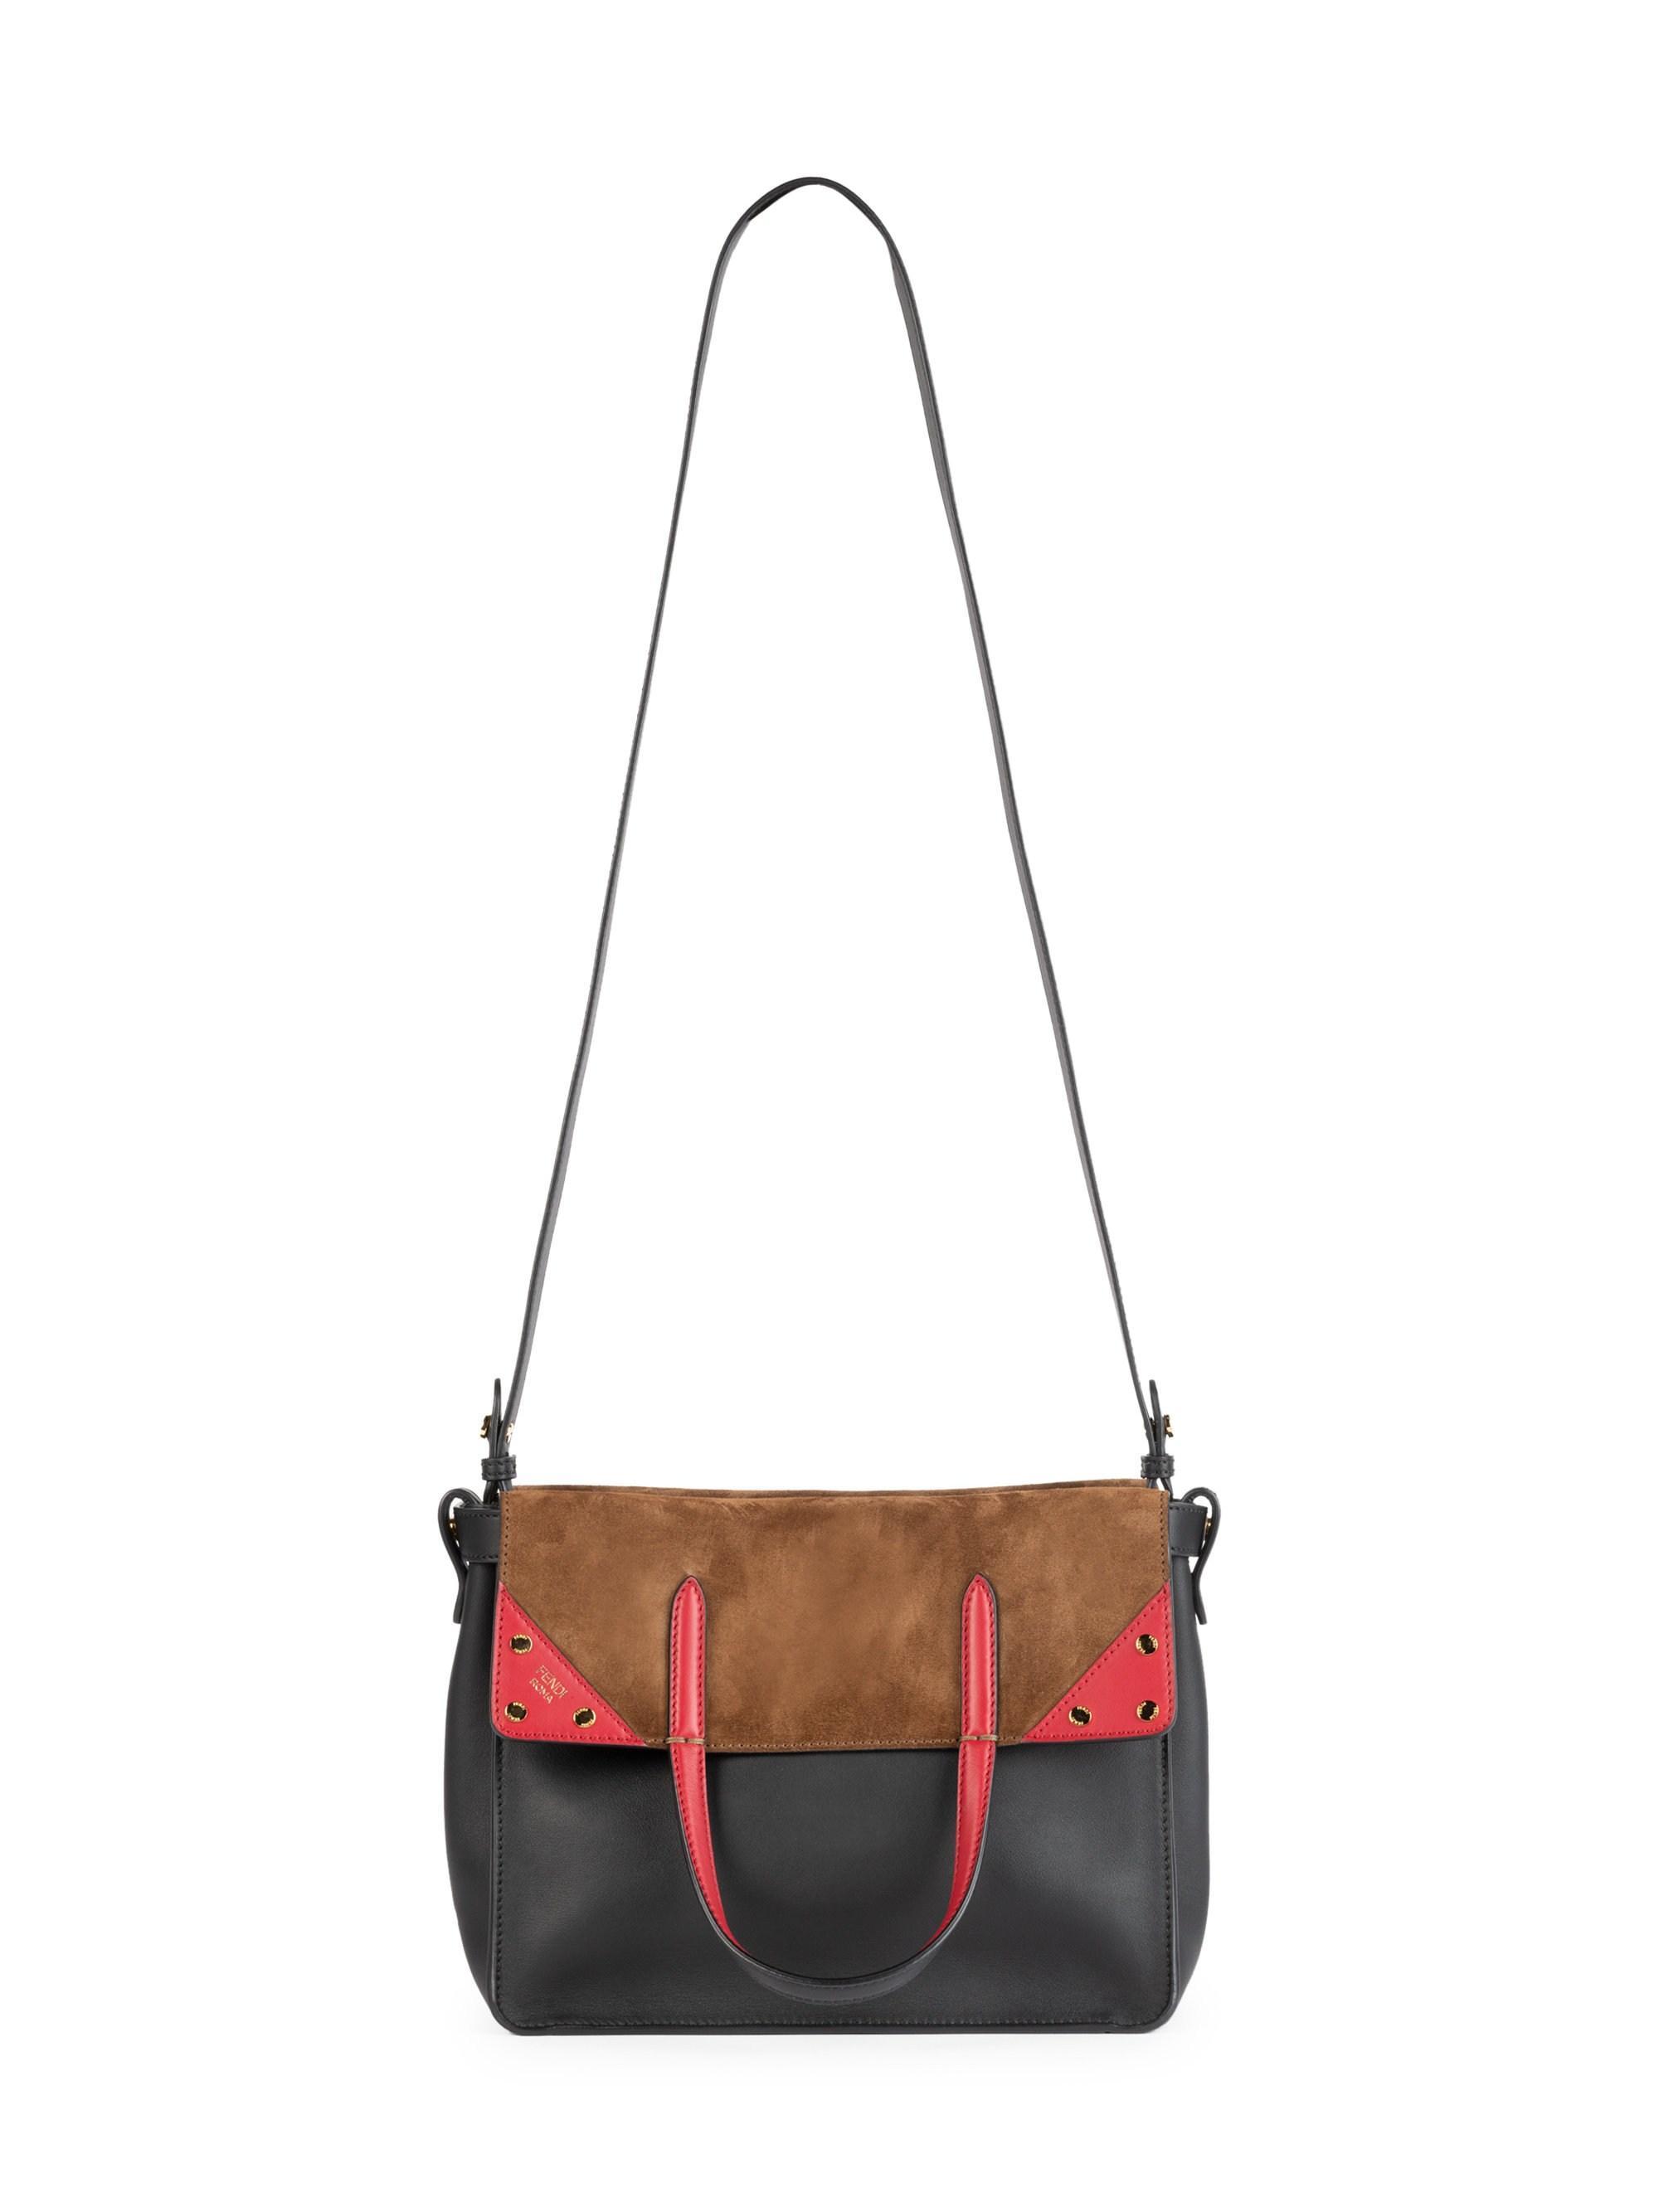 Lyst - Fendi Women s Leather   Suede Tri-tone Foldover Tote 0526617350f1a